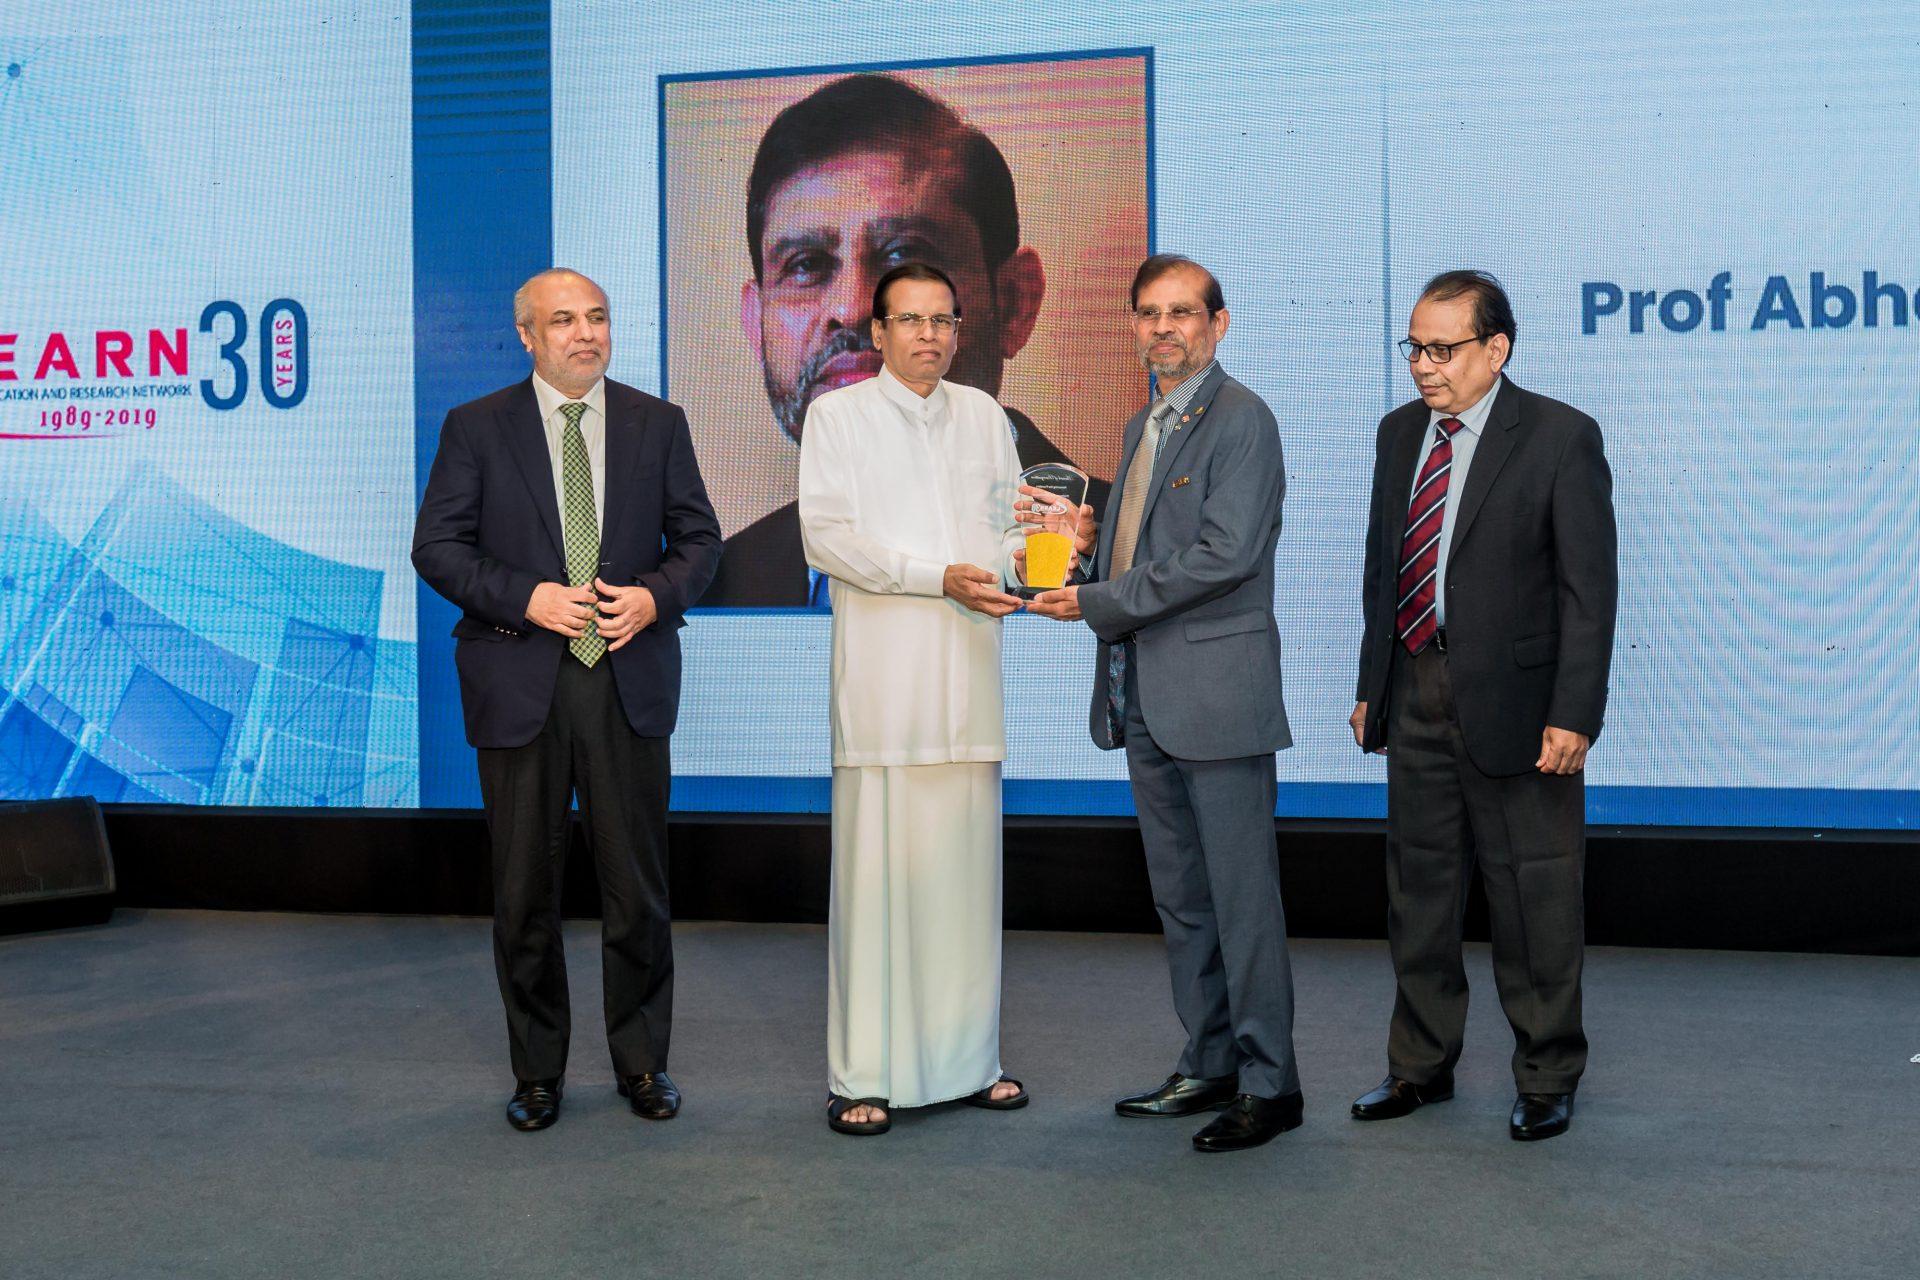 Abhaya Receiving LEARN 30 Anniversary Award